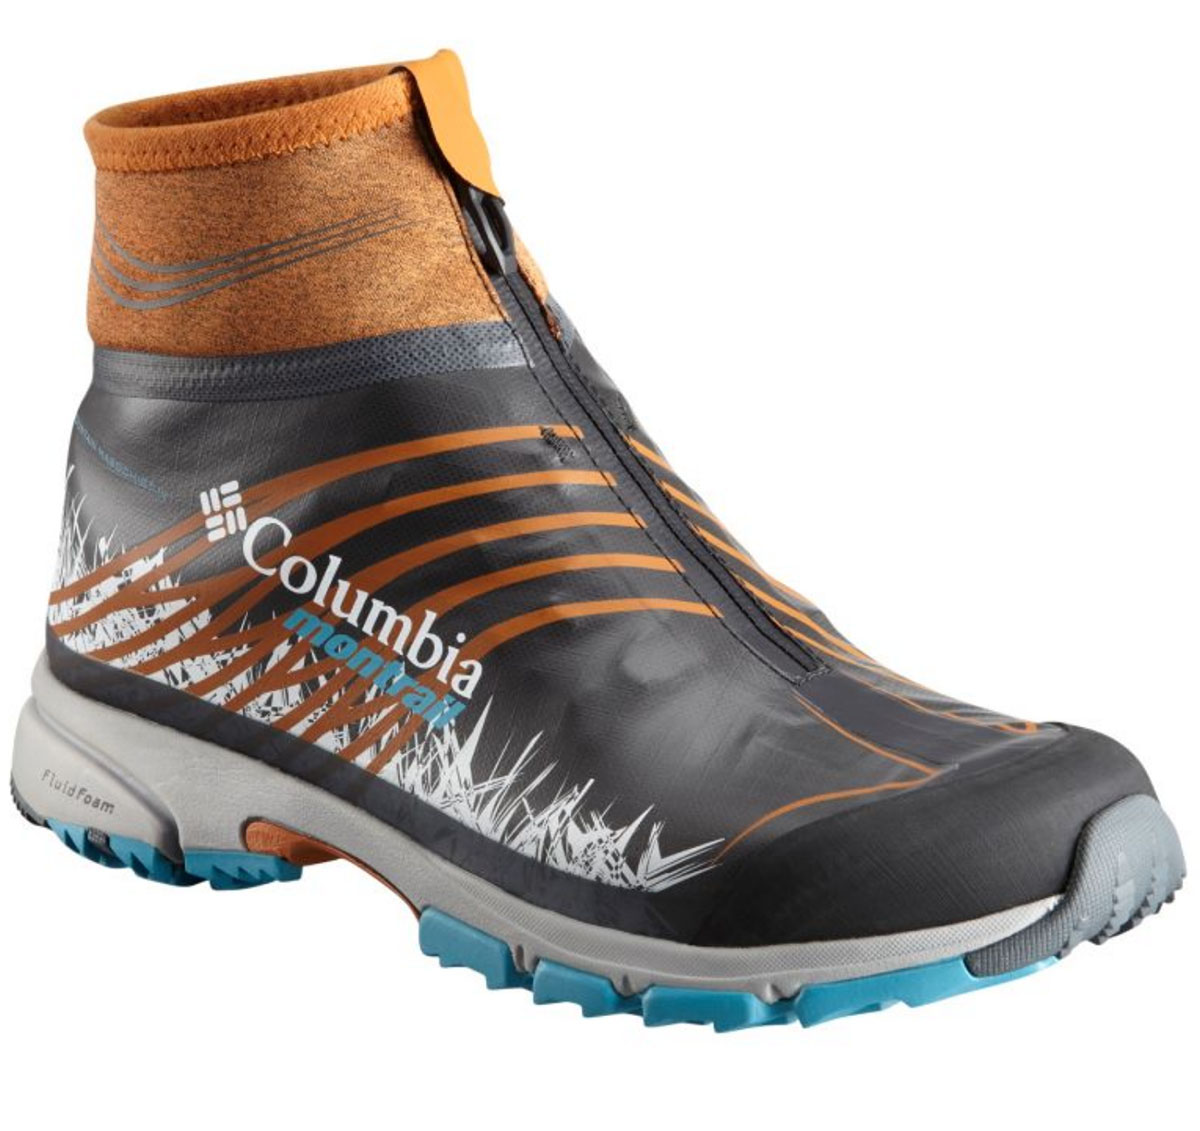 Columbia/Montrail Mountain Masochist IV OutDry Extreme